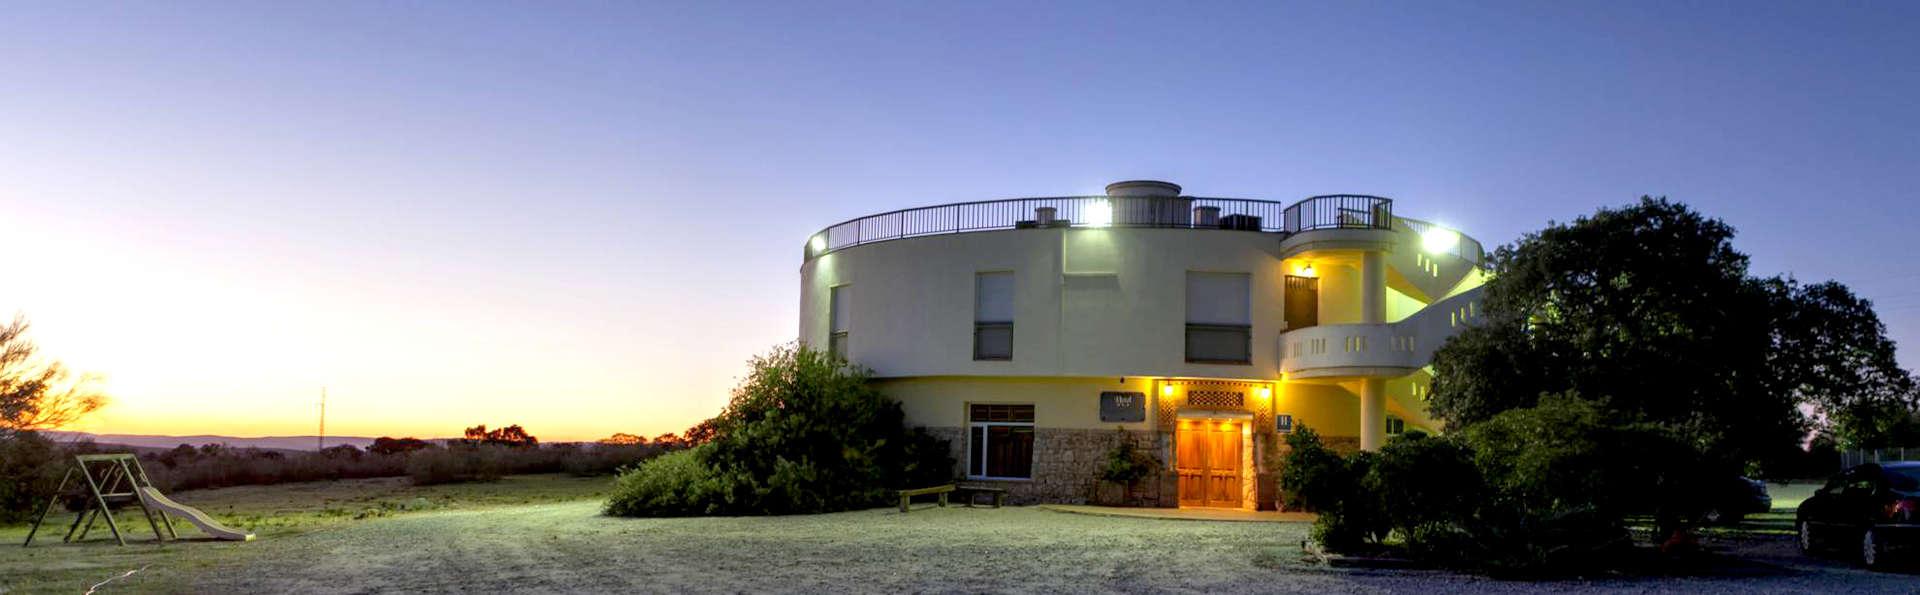 Hotel Paraje La Lambra - Edit_Front4.jpg